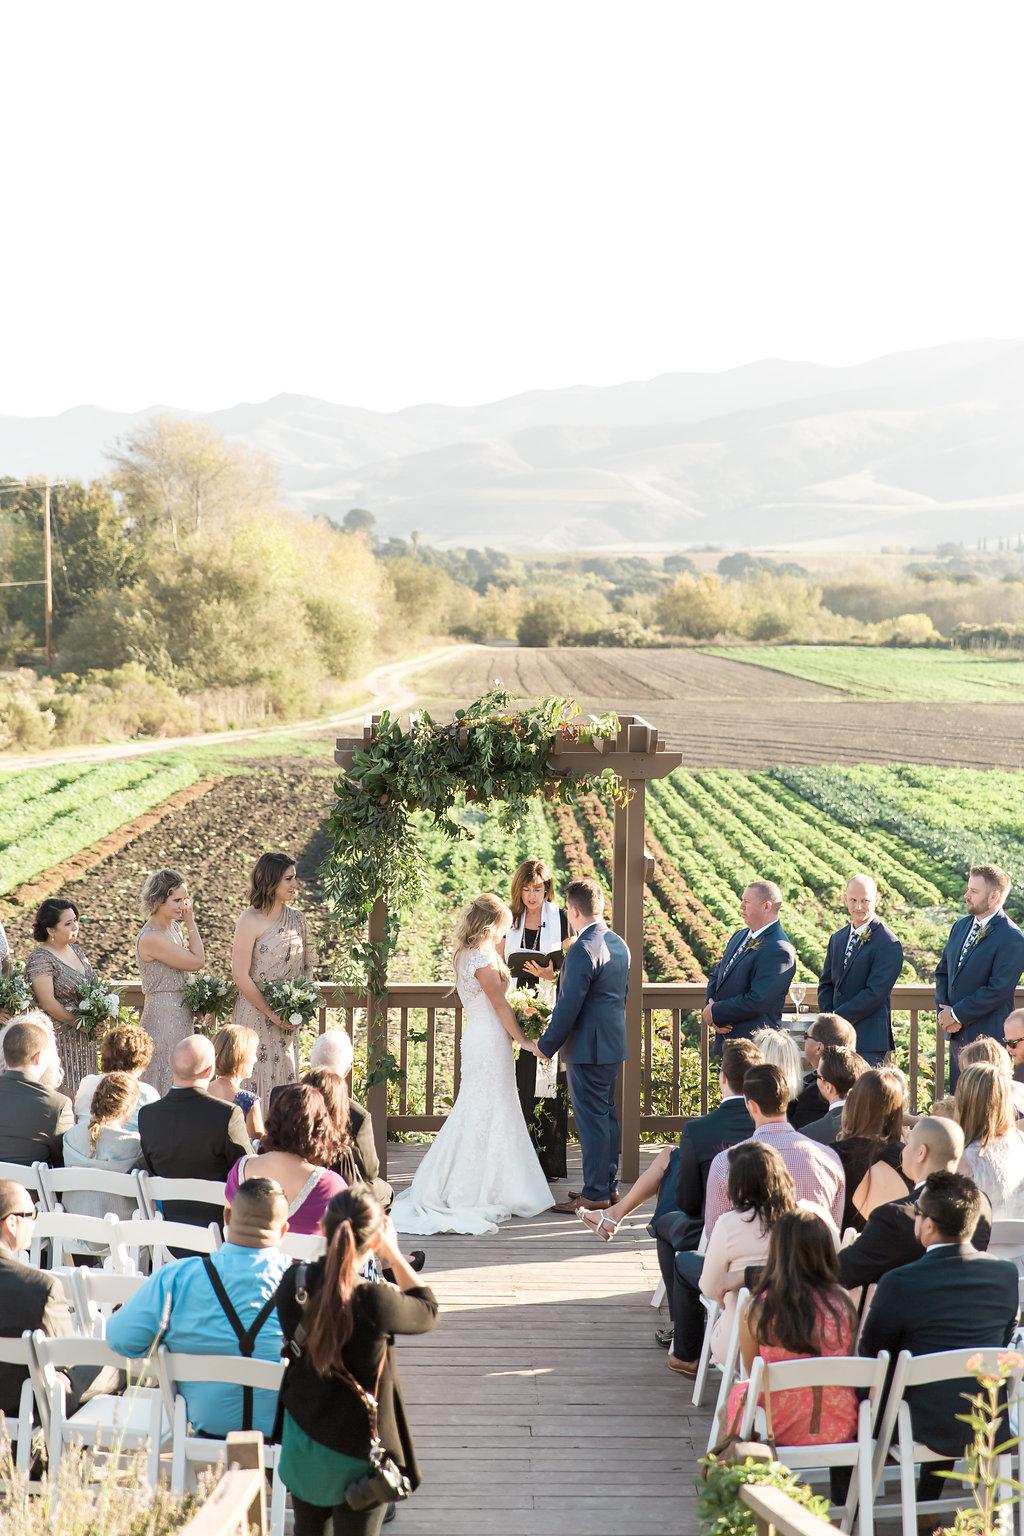 www.santabarbarawedding.com | Jessica Angell Photography | Apple Creek Ranch | Ceremony